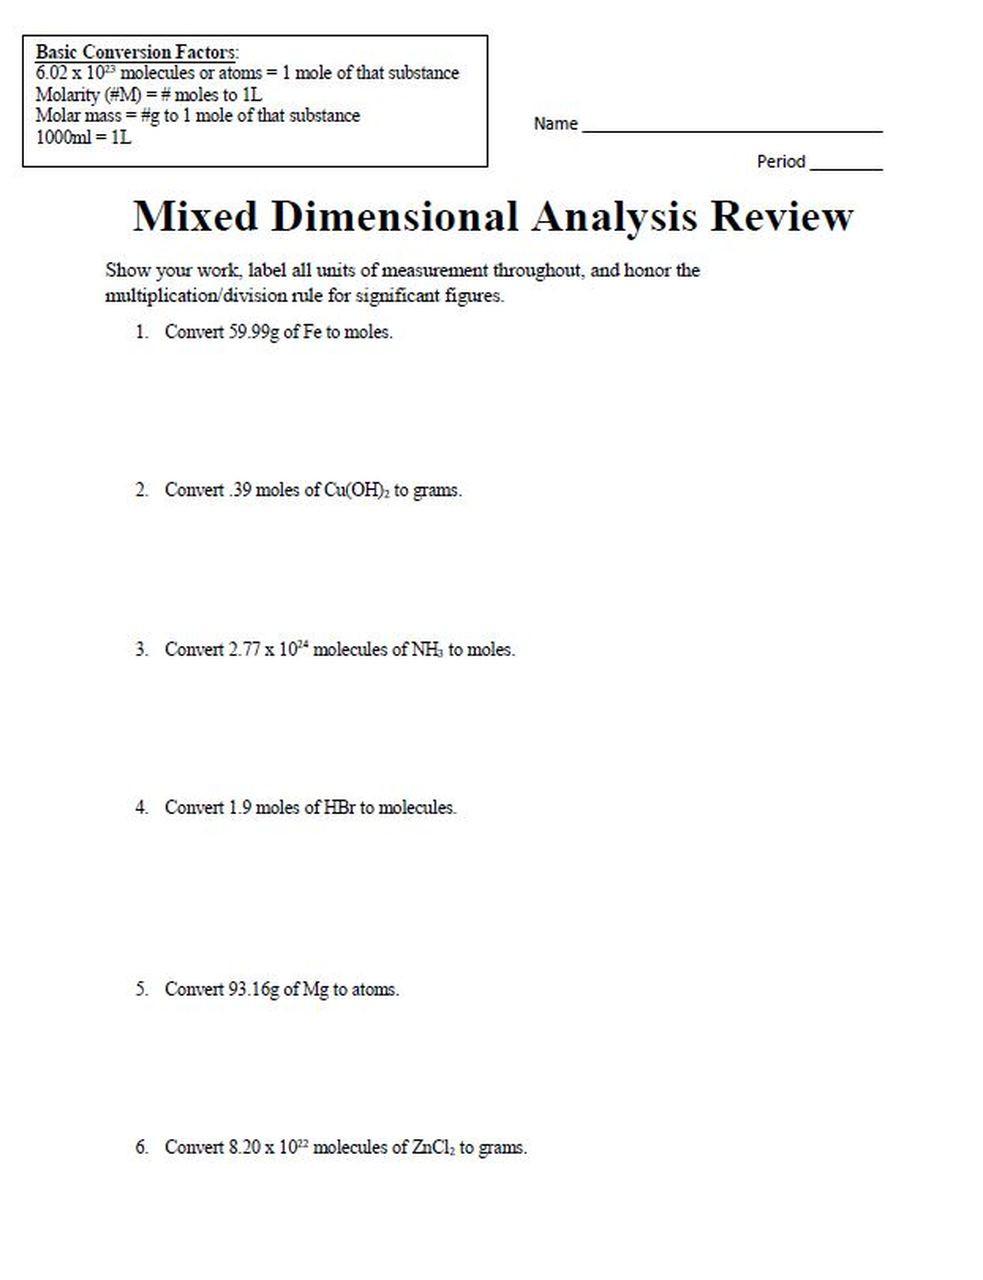 Dimensional Analysis Worksheet 2 Mixed Dimensional Analysis Review Problem Set